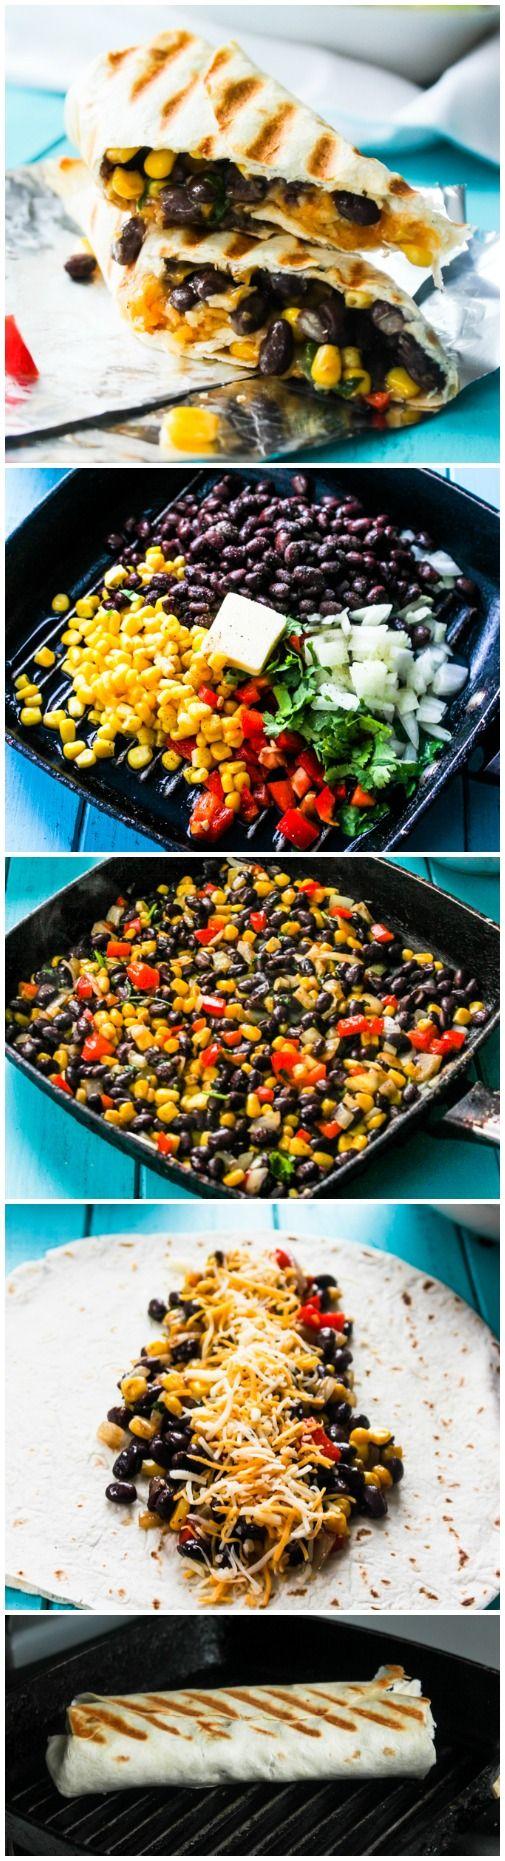 Quick and Easy Crispy Black Bean and Rice Burritos– Use vegan alternative